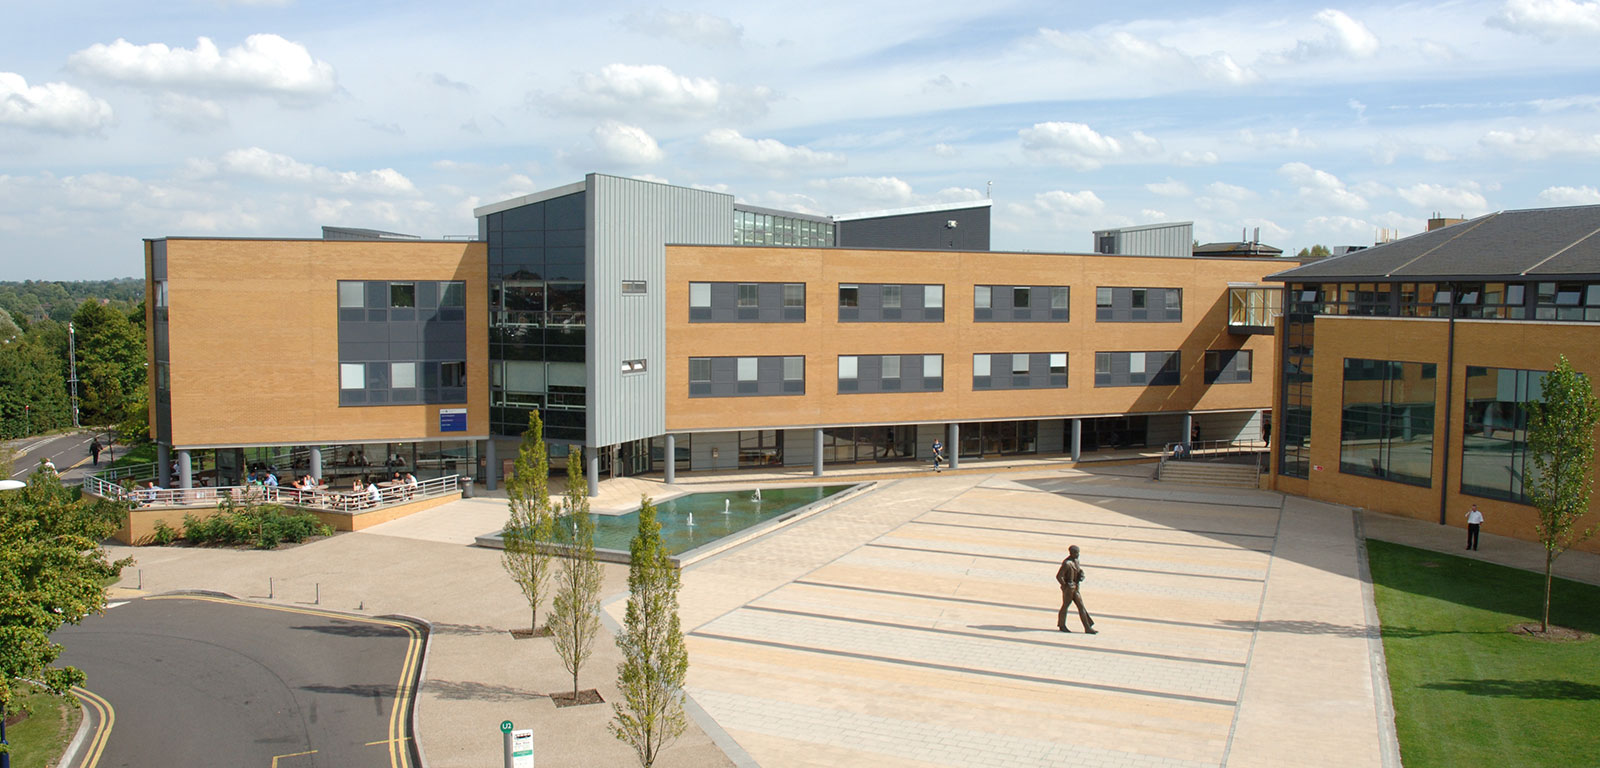 School image 3